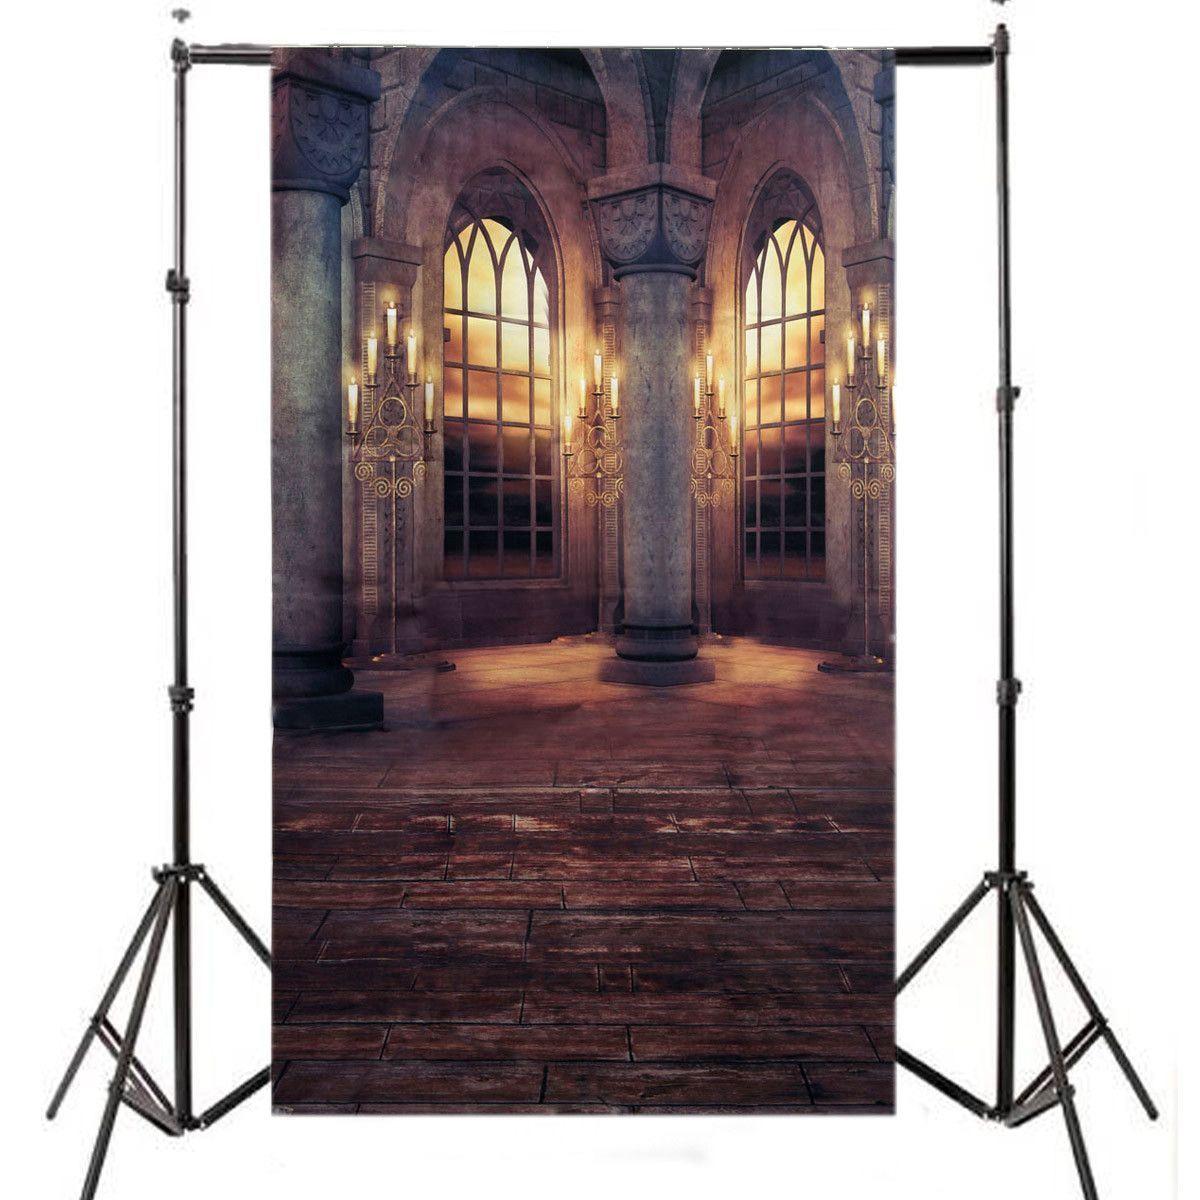 CES-3x5FT Retro Palace Vinyl Cloth Photography Prop Studio Backdrop Photo Background цена и фото